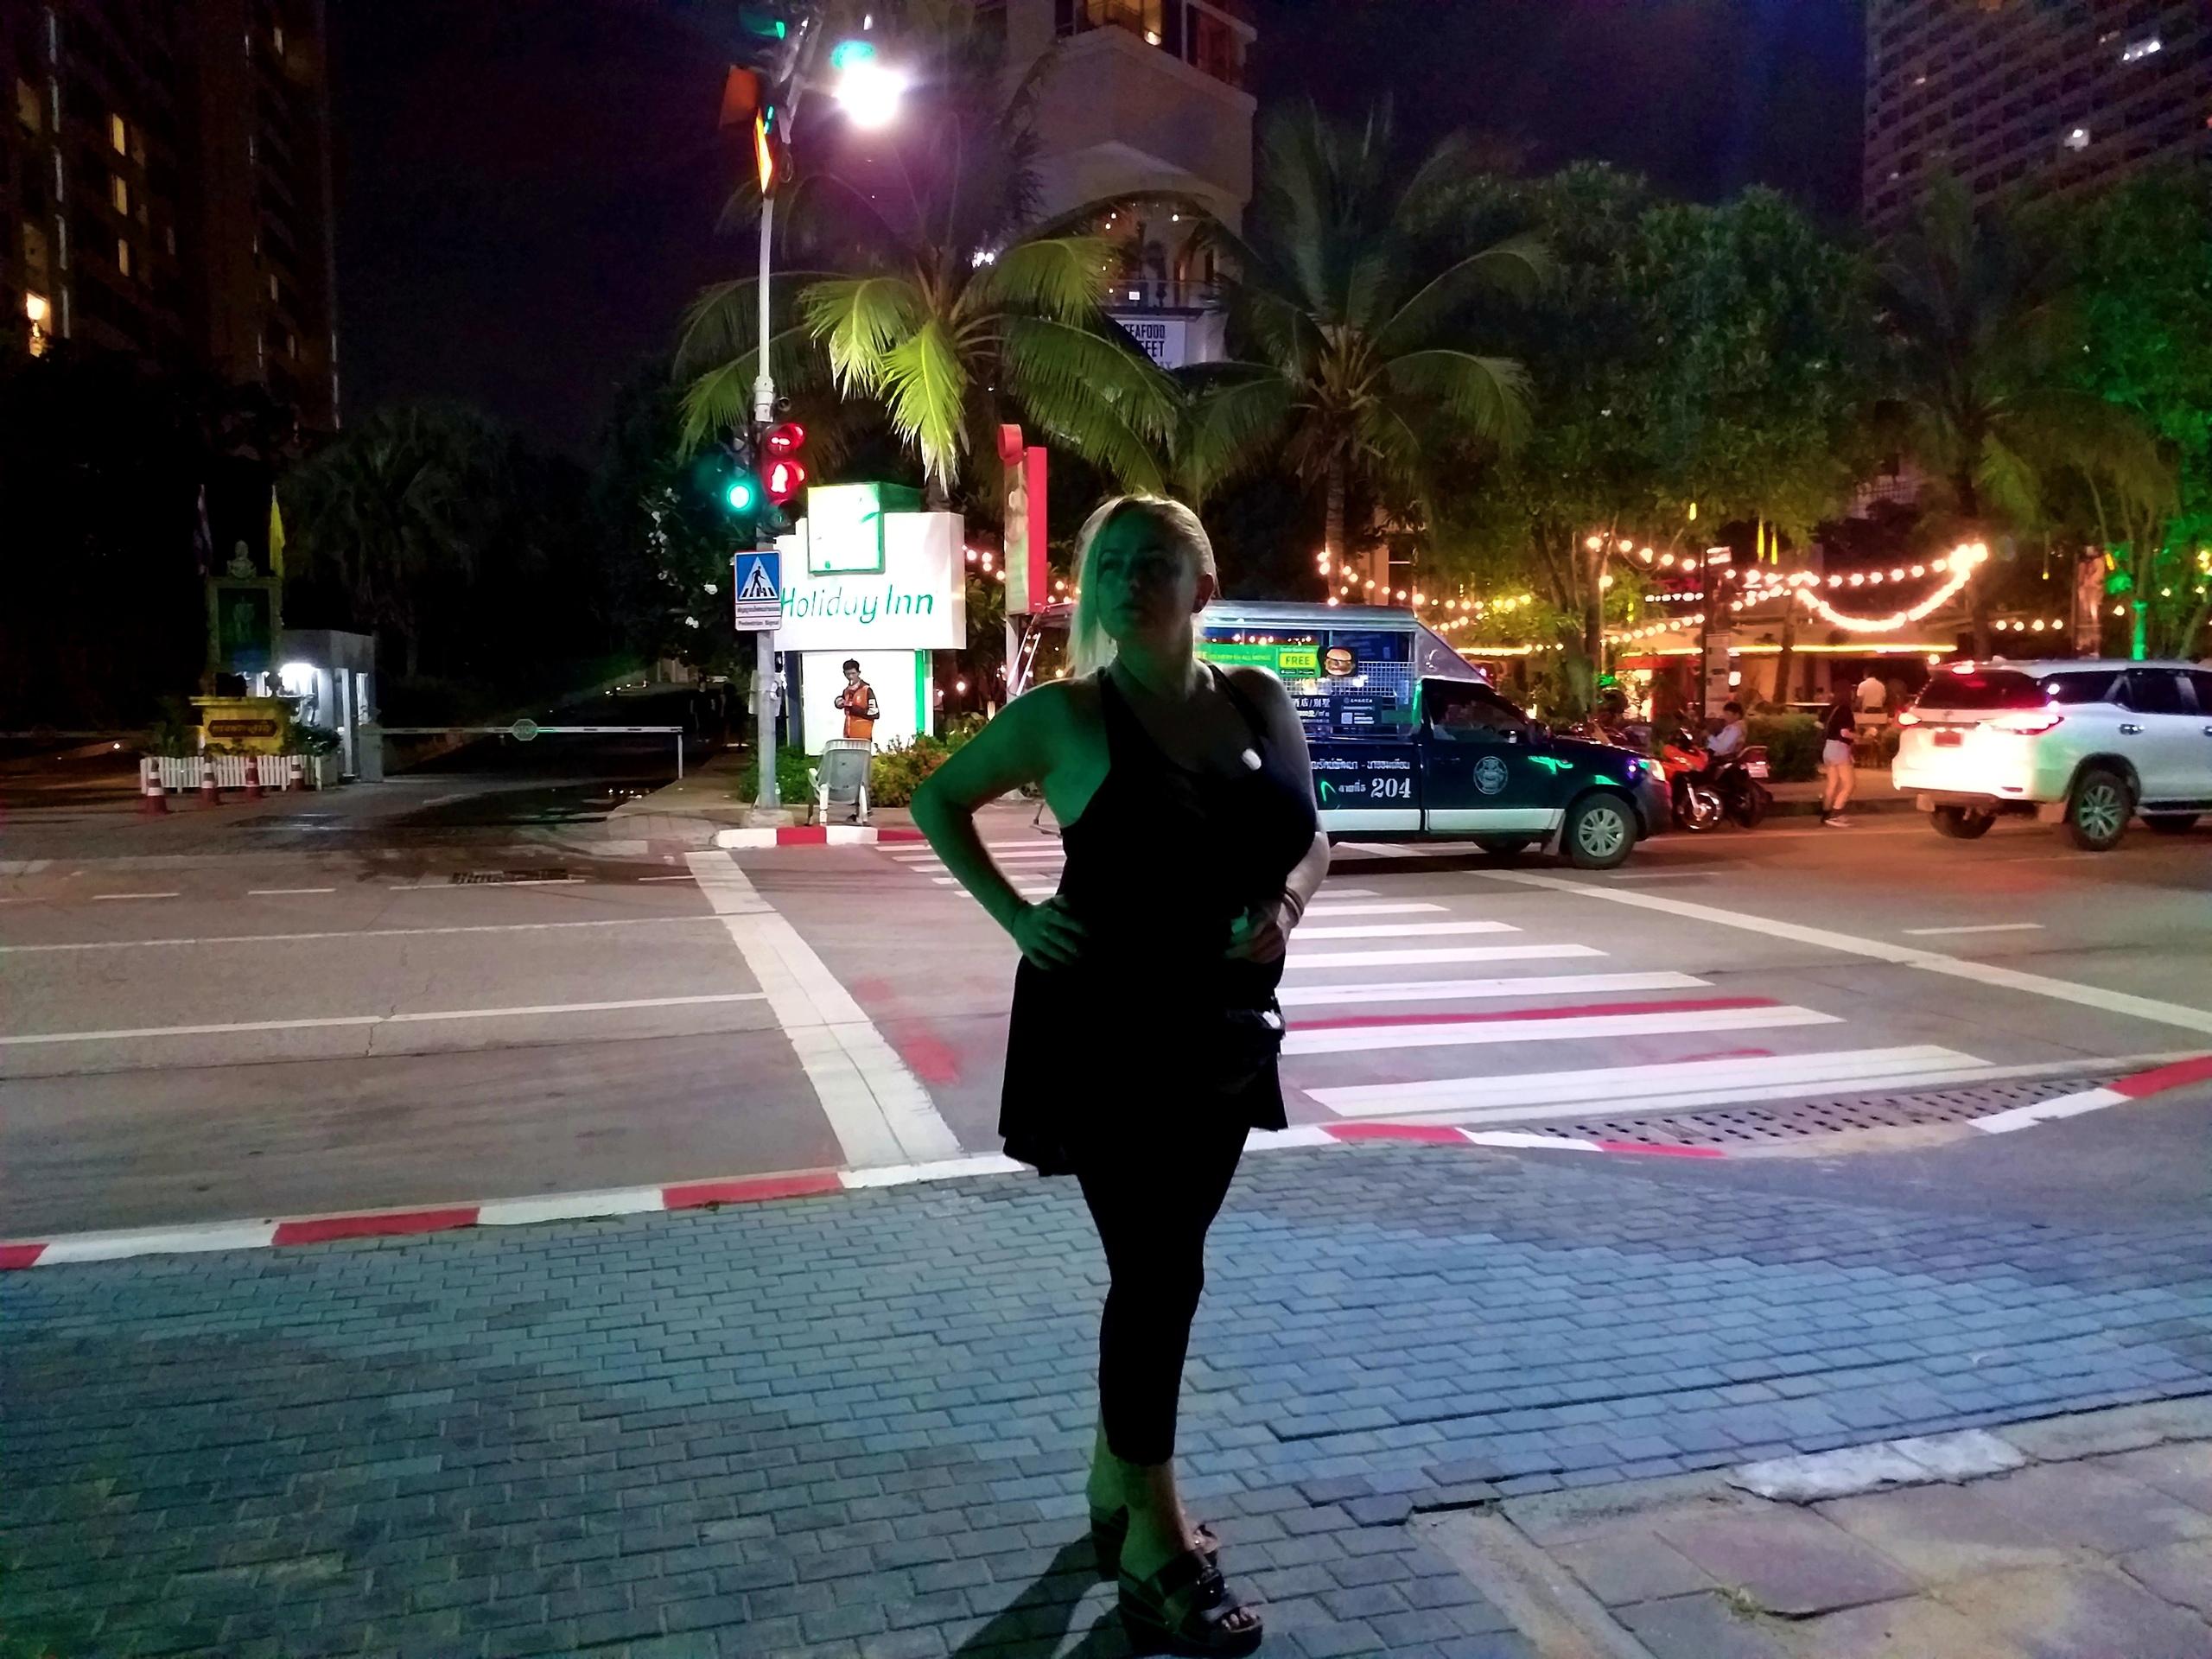 Елена Руденко (Валтея). Мои путешествия. Таиланд ( 2019 г. осень) ФОТО. YBBDltE1yCs